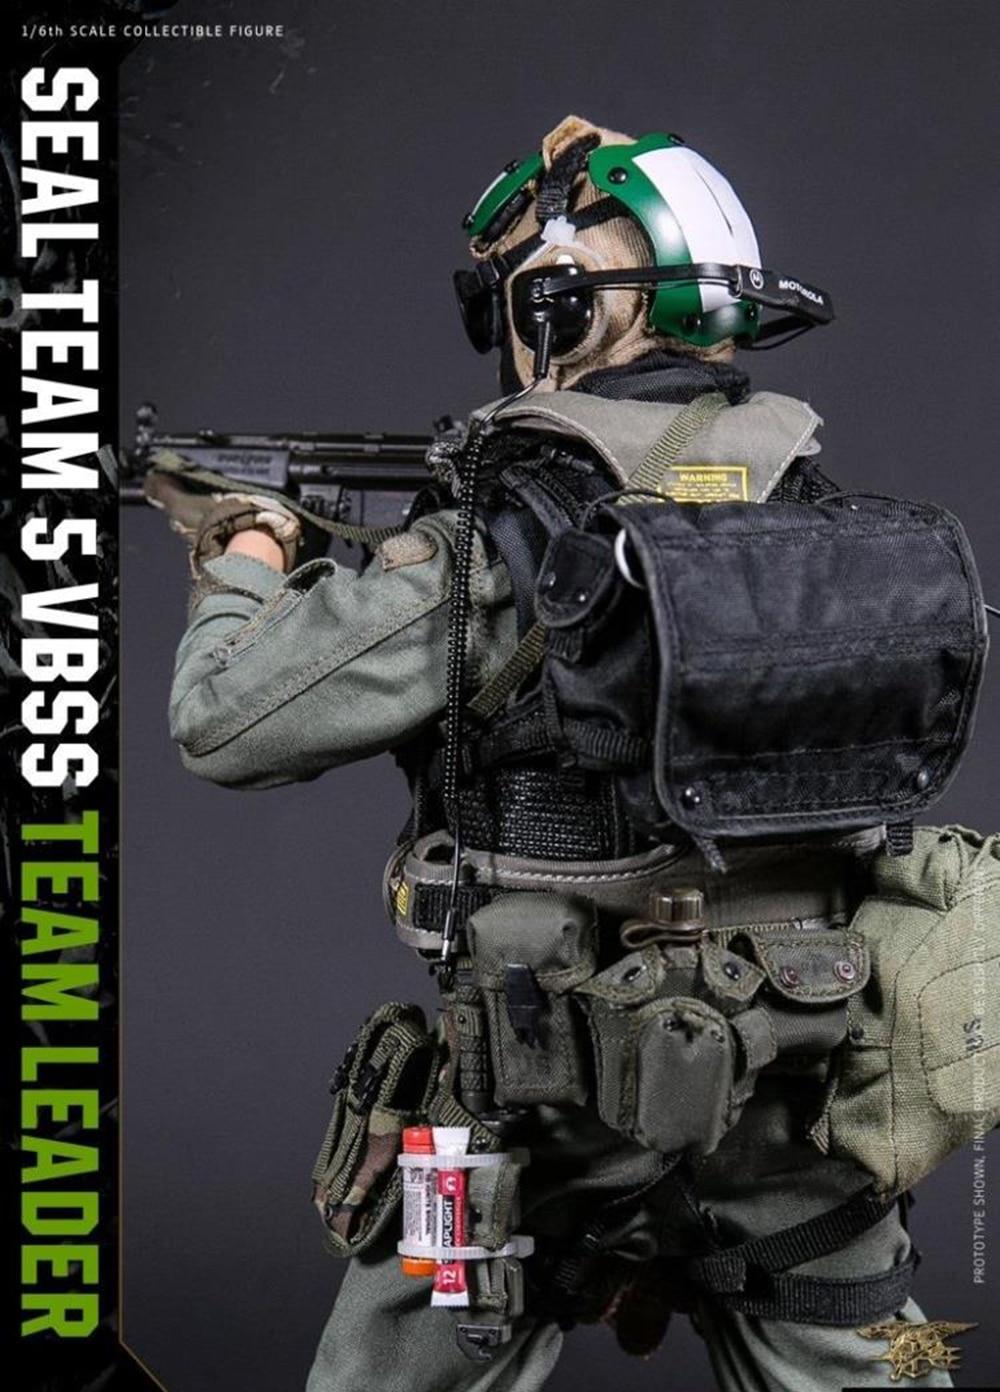 Damtoys Navy Seal Team 5 VBSS Team Leader nude body 1//6 toys Dam action figure